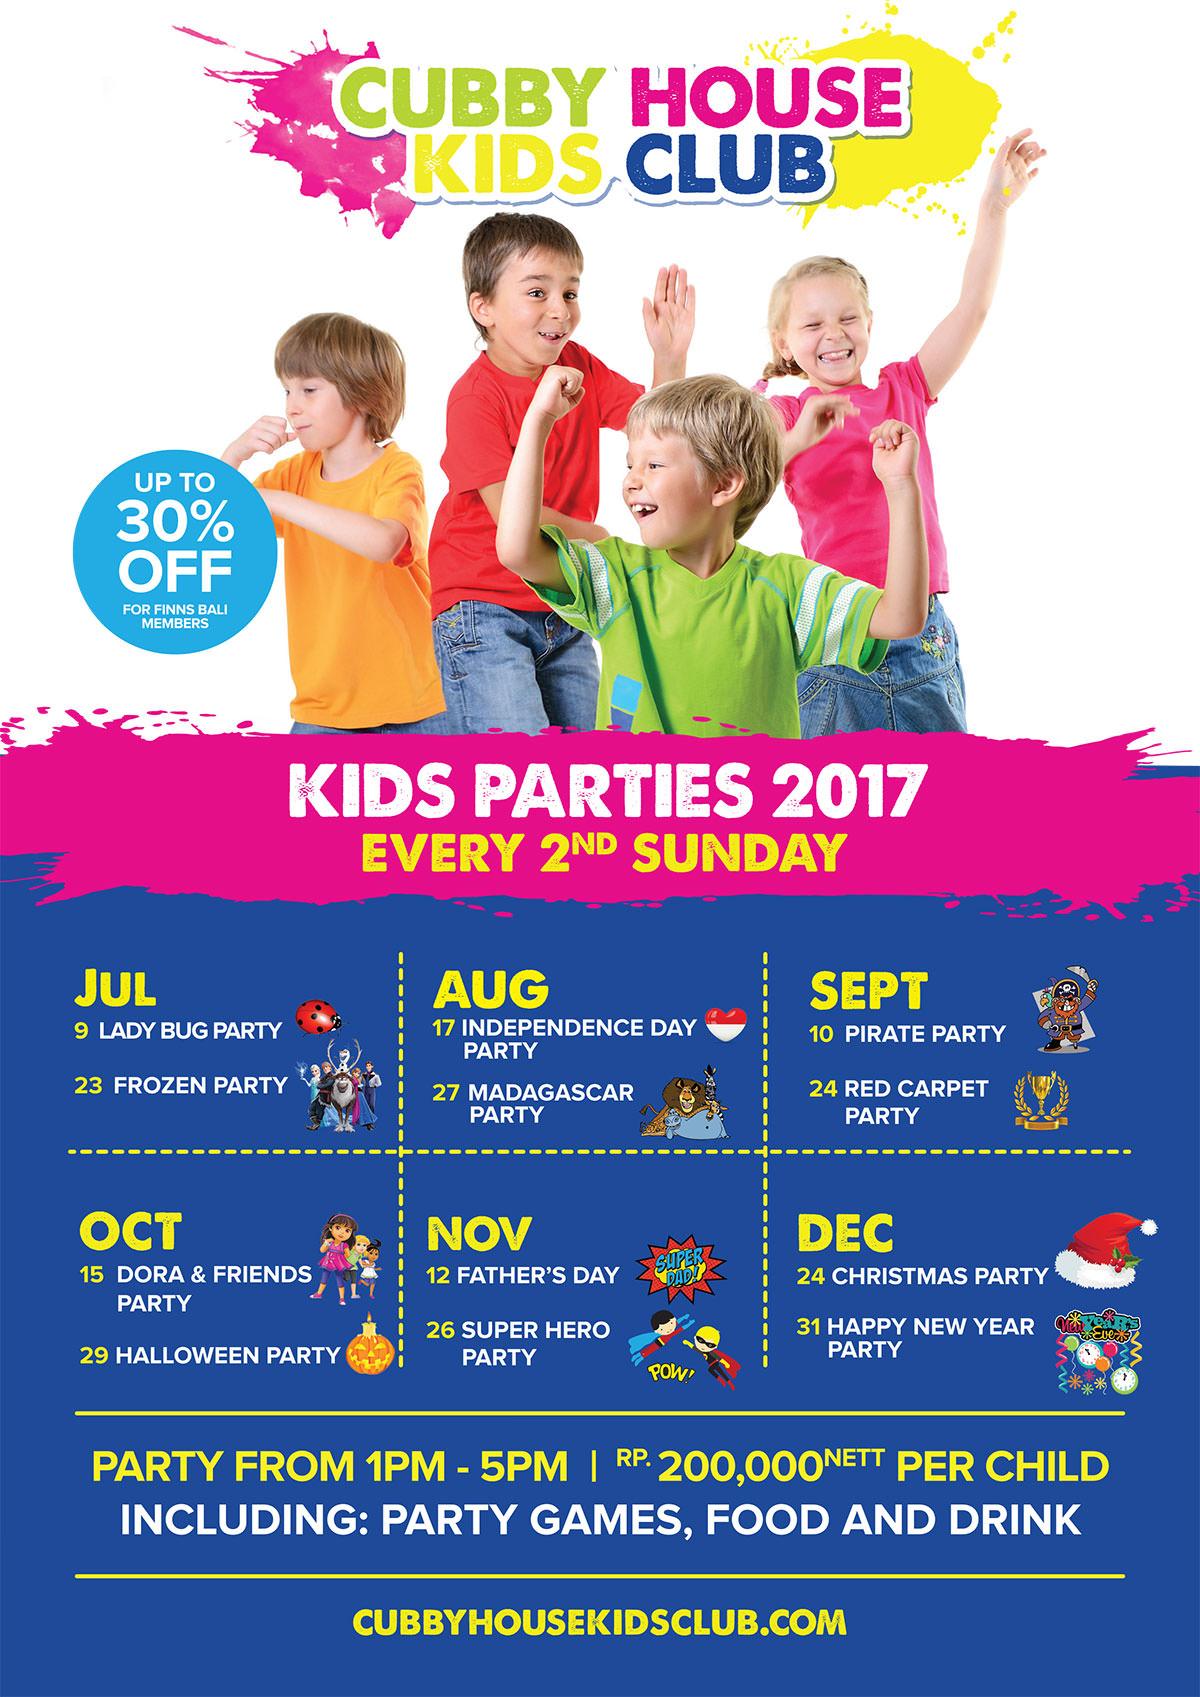 201707-kids-parties-july-2nd